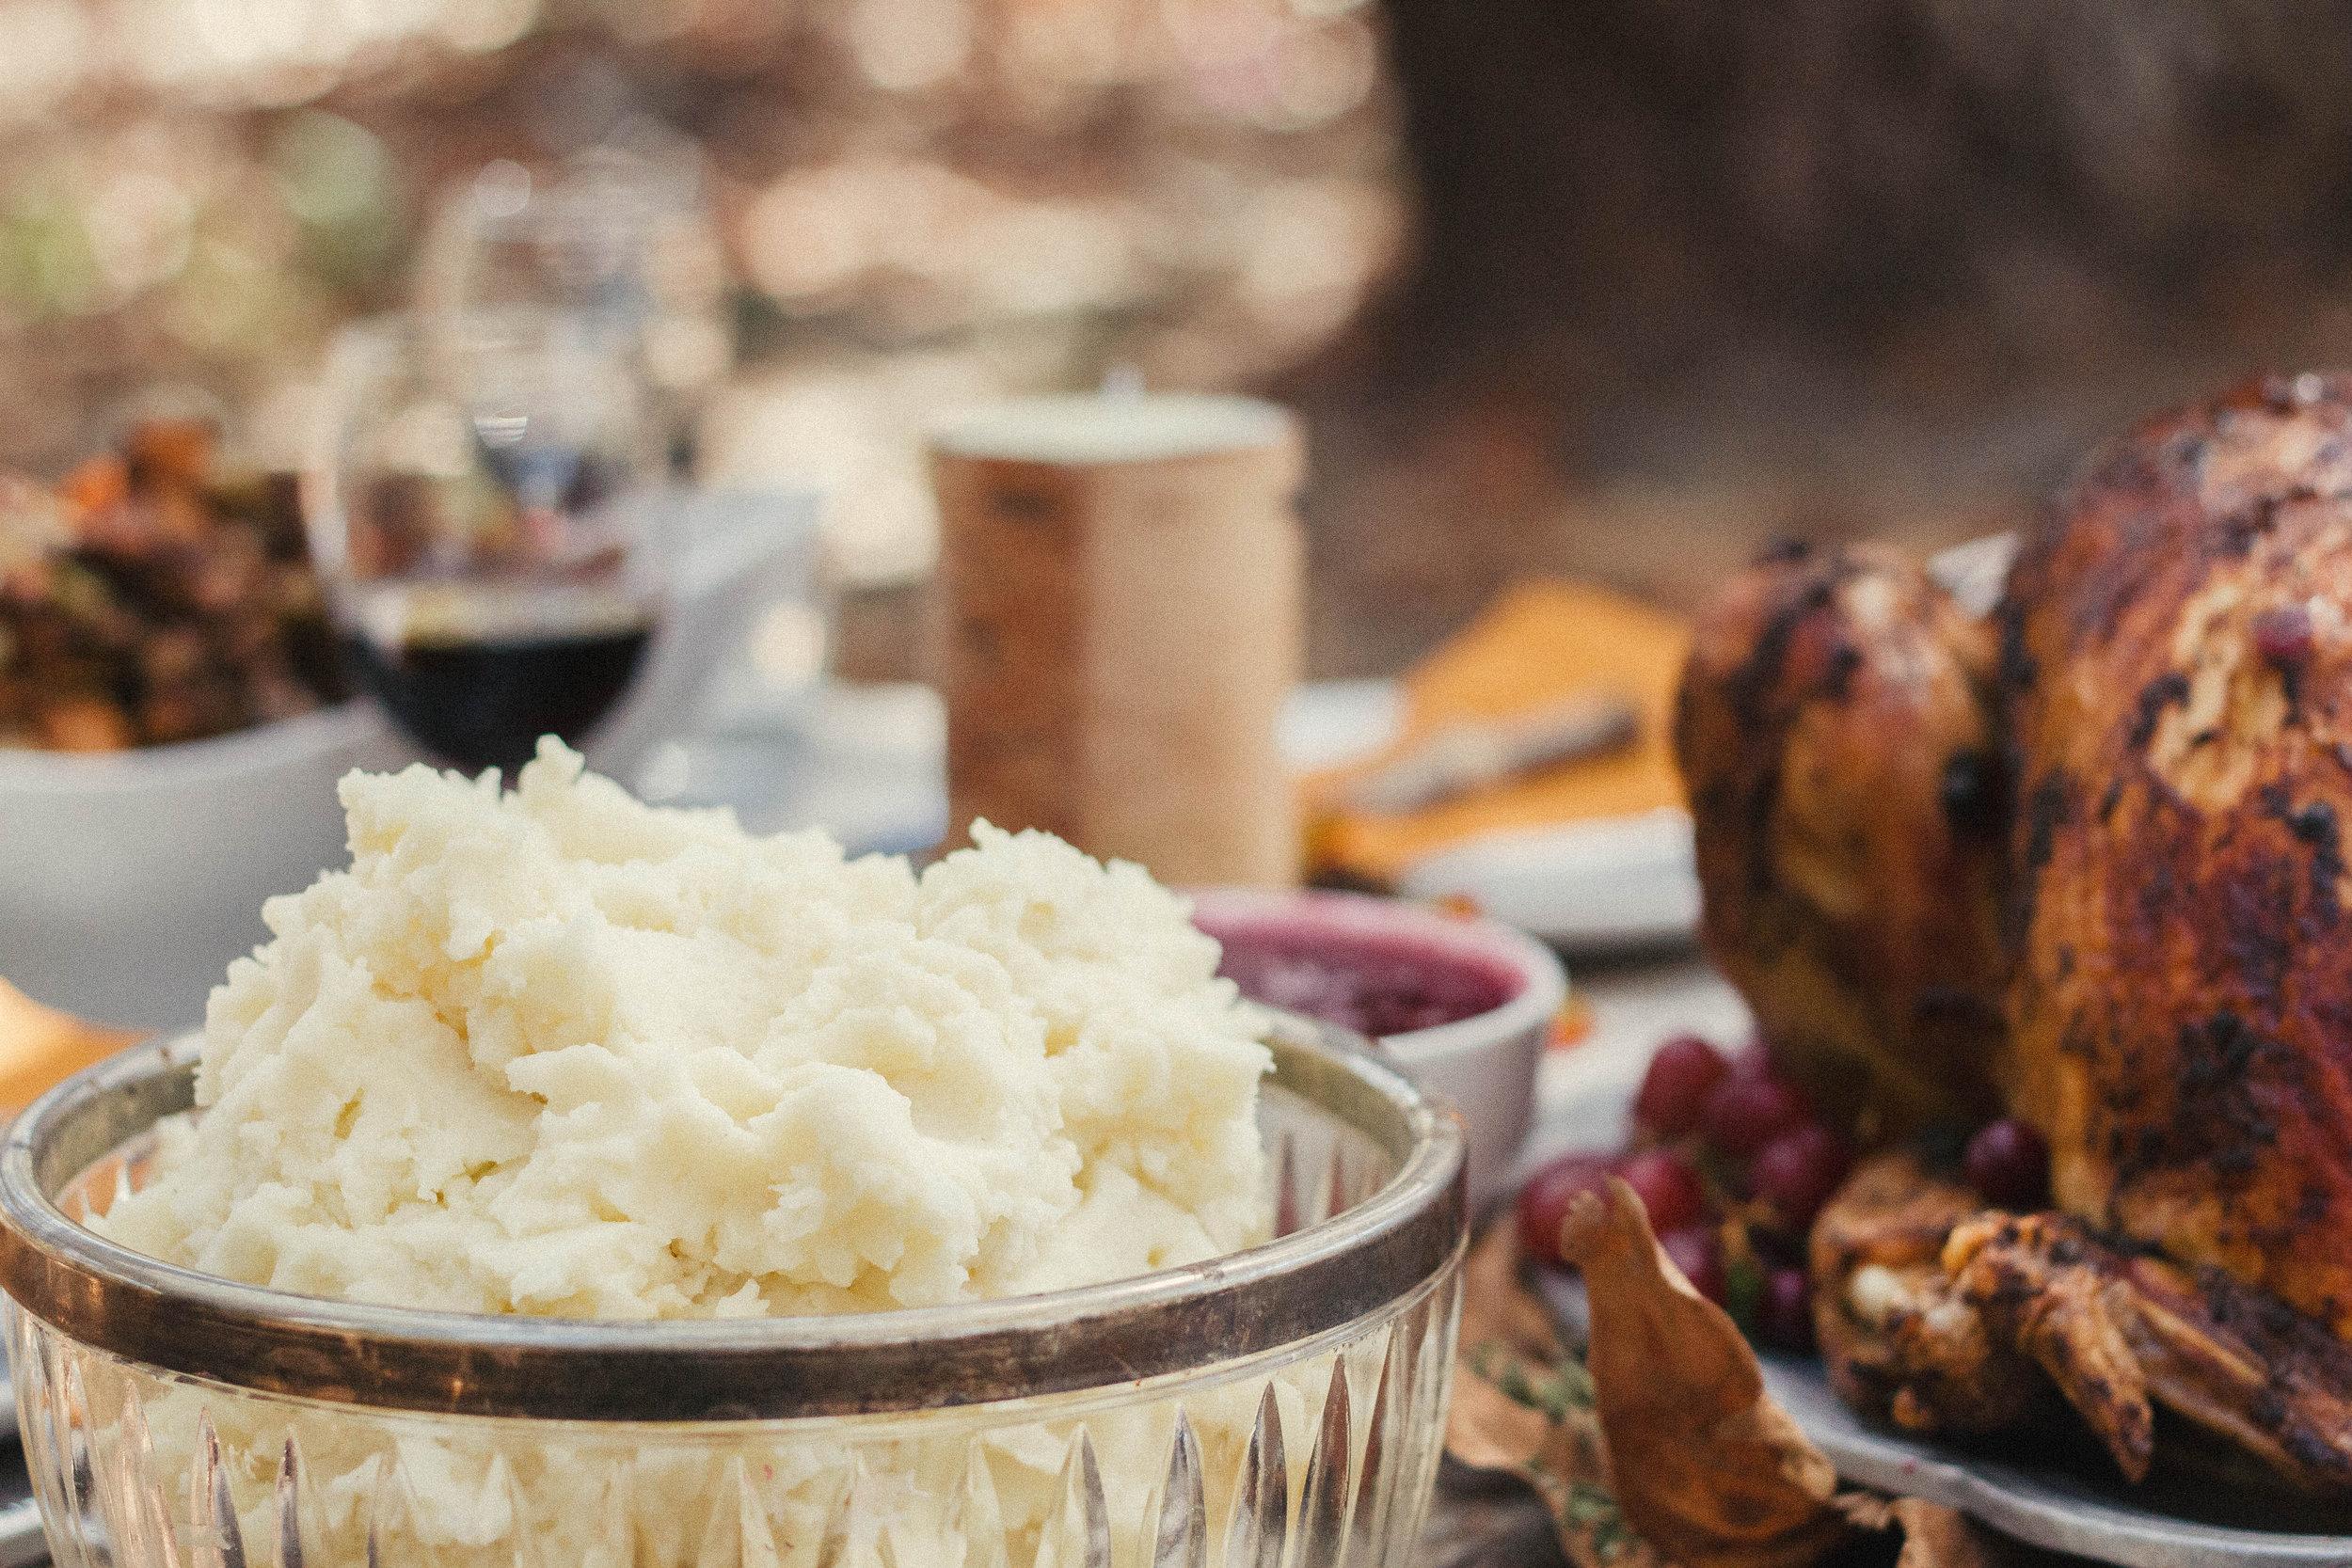 Mashed potatoes and turkey.jpg